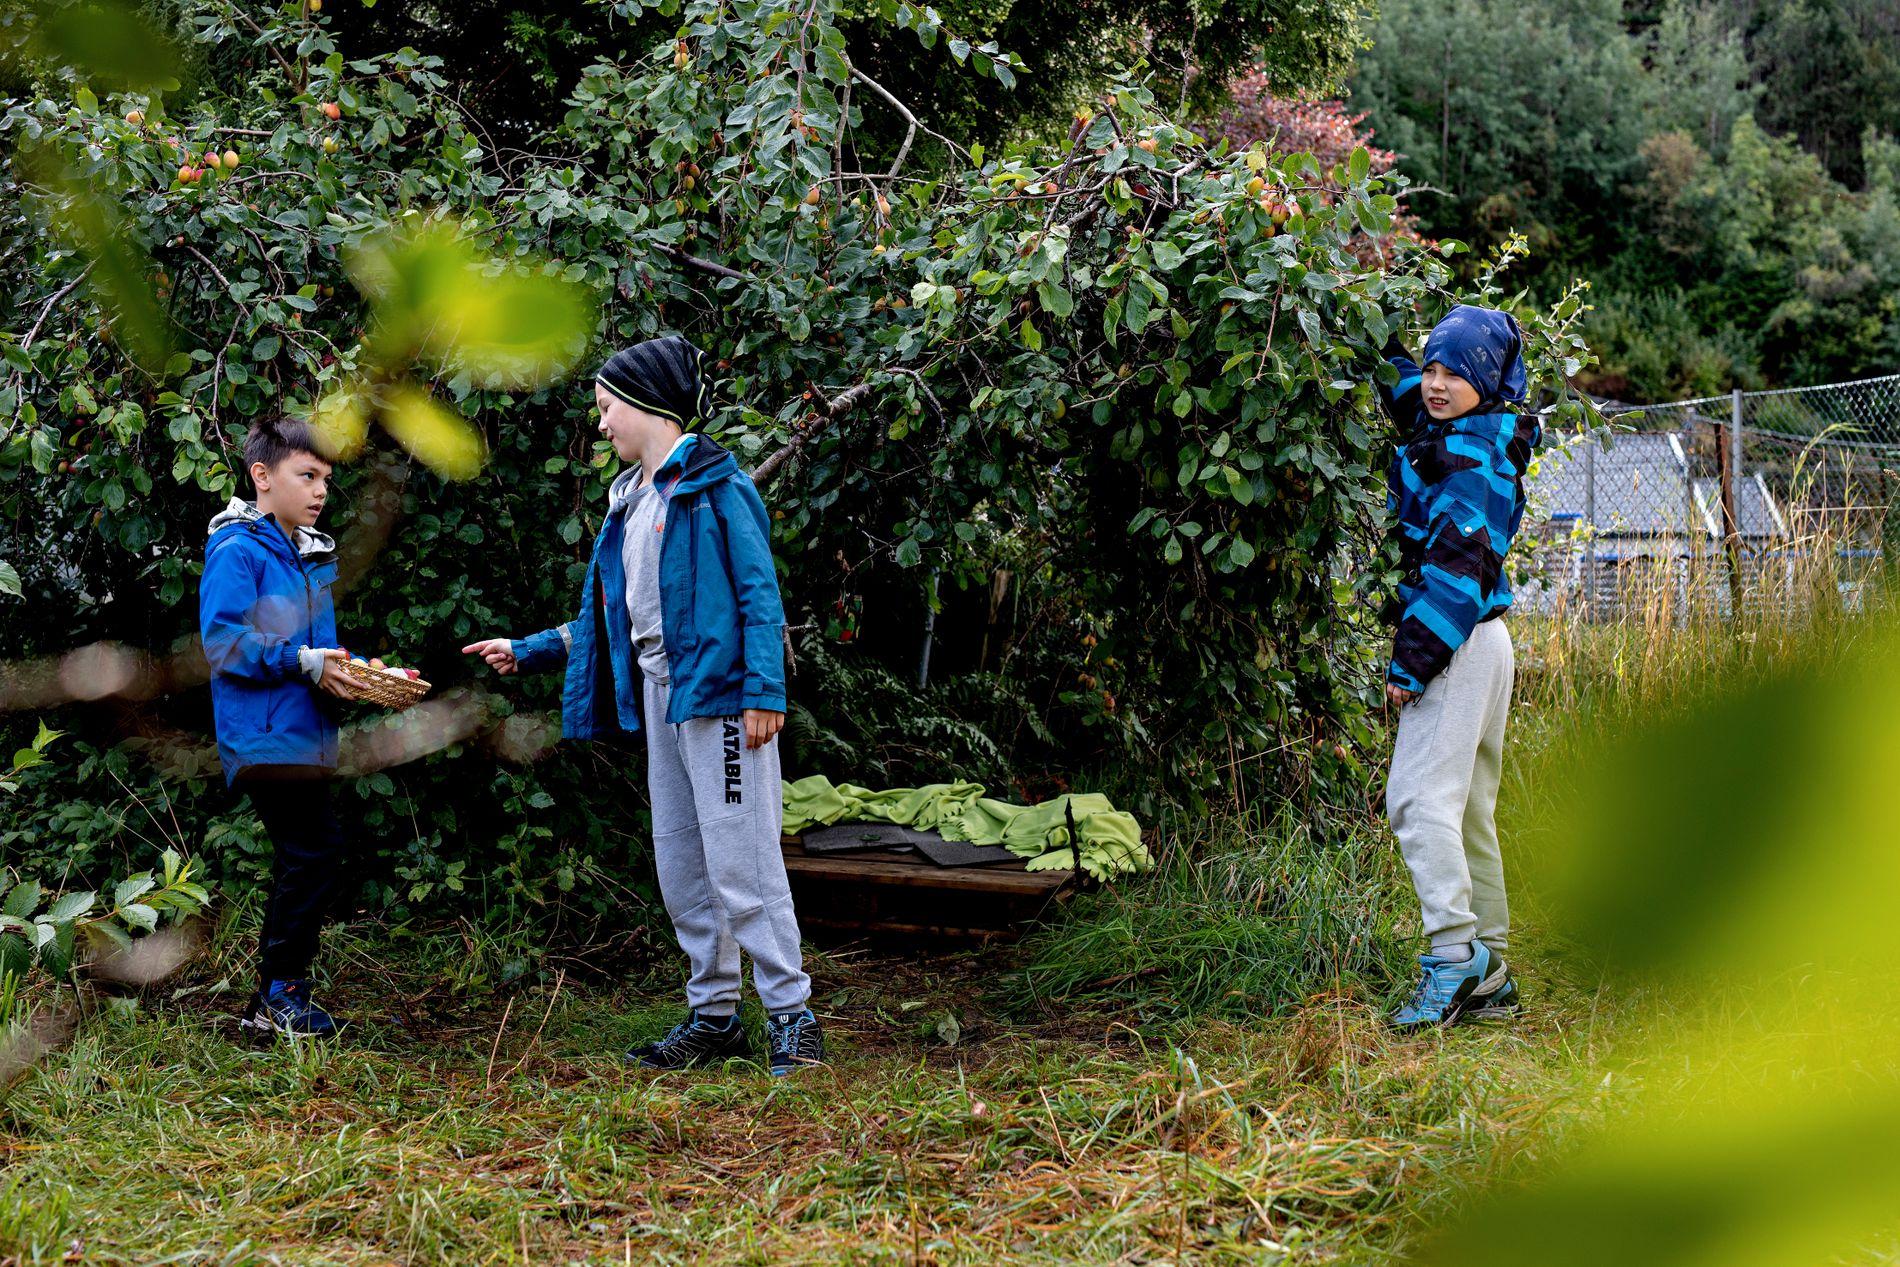 GØY: Niåringane Benjamin, Bjørnar og Jonas er mellom dei ivrigaste hageentusiastane. – Det er gøy med skulehage, seier Jonas, medan han plukkar plommer frå det bugnande treet.